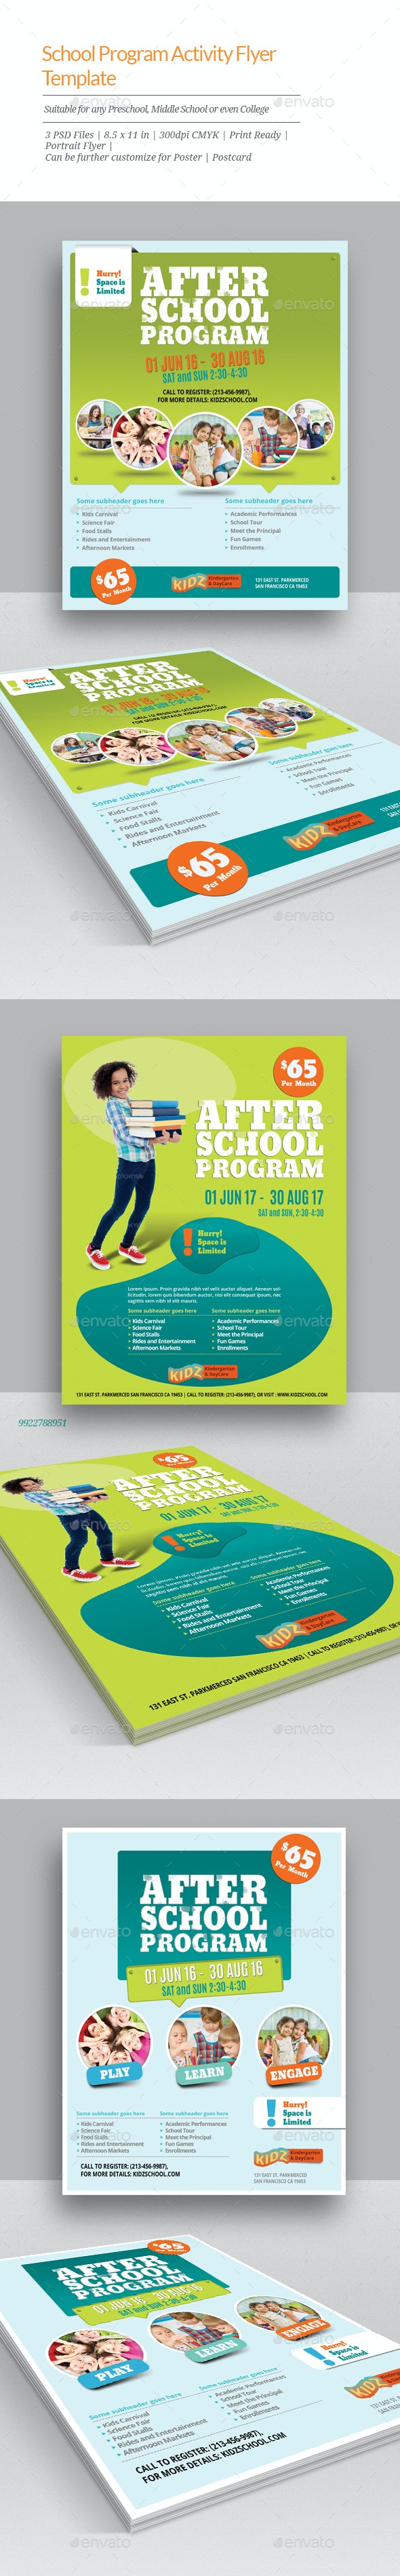 school program activity flyer templates by geon graphicriver